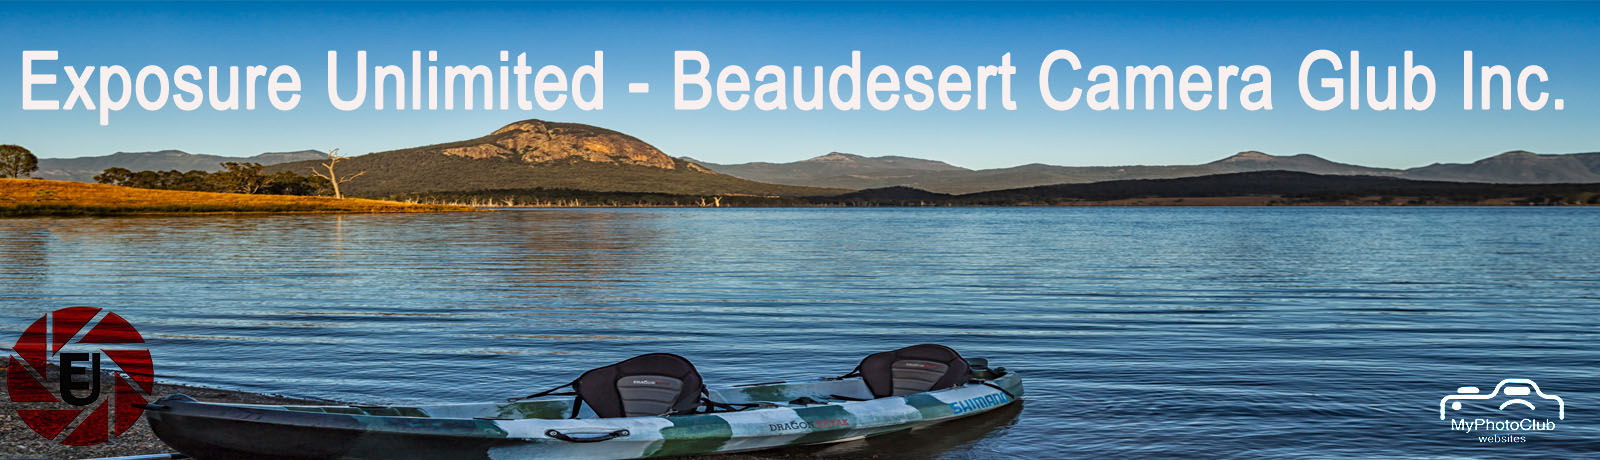 Exposure Unlimited ~ Beaudesert Camera Club Incorporated